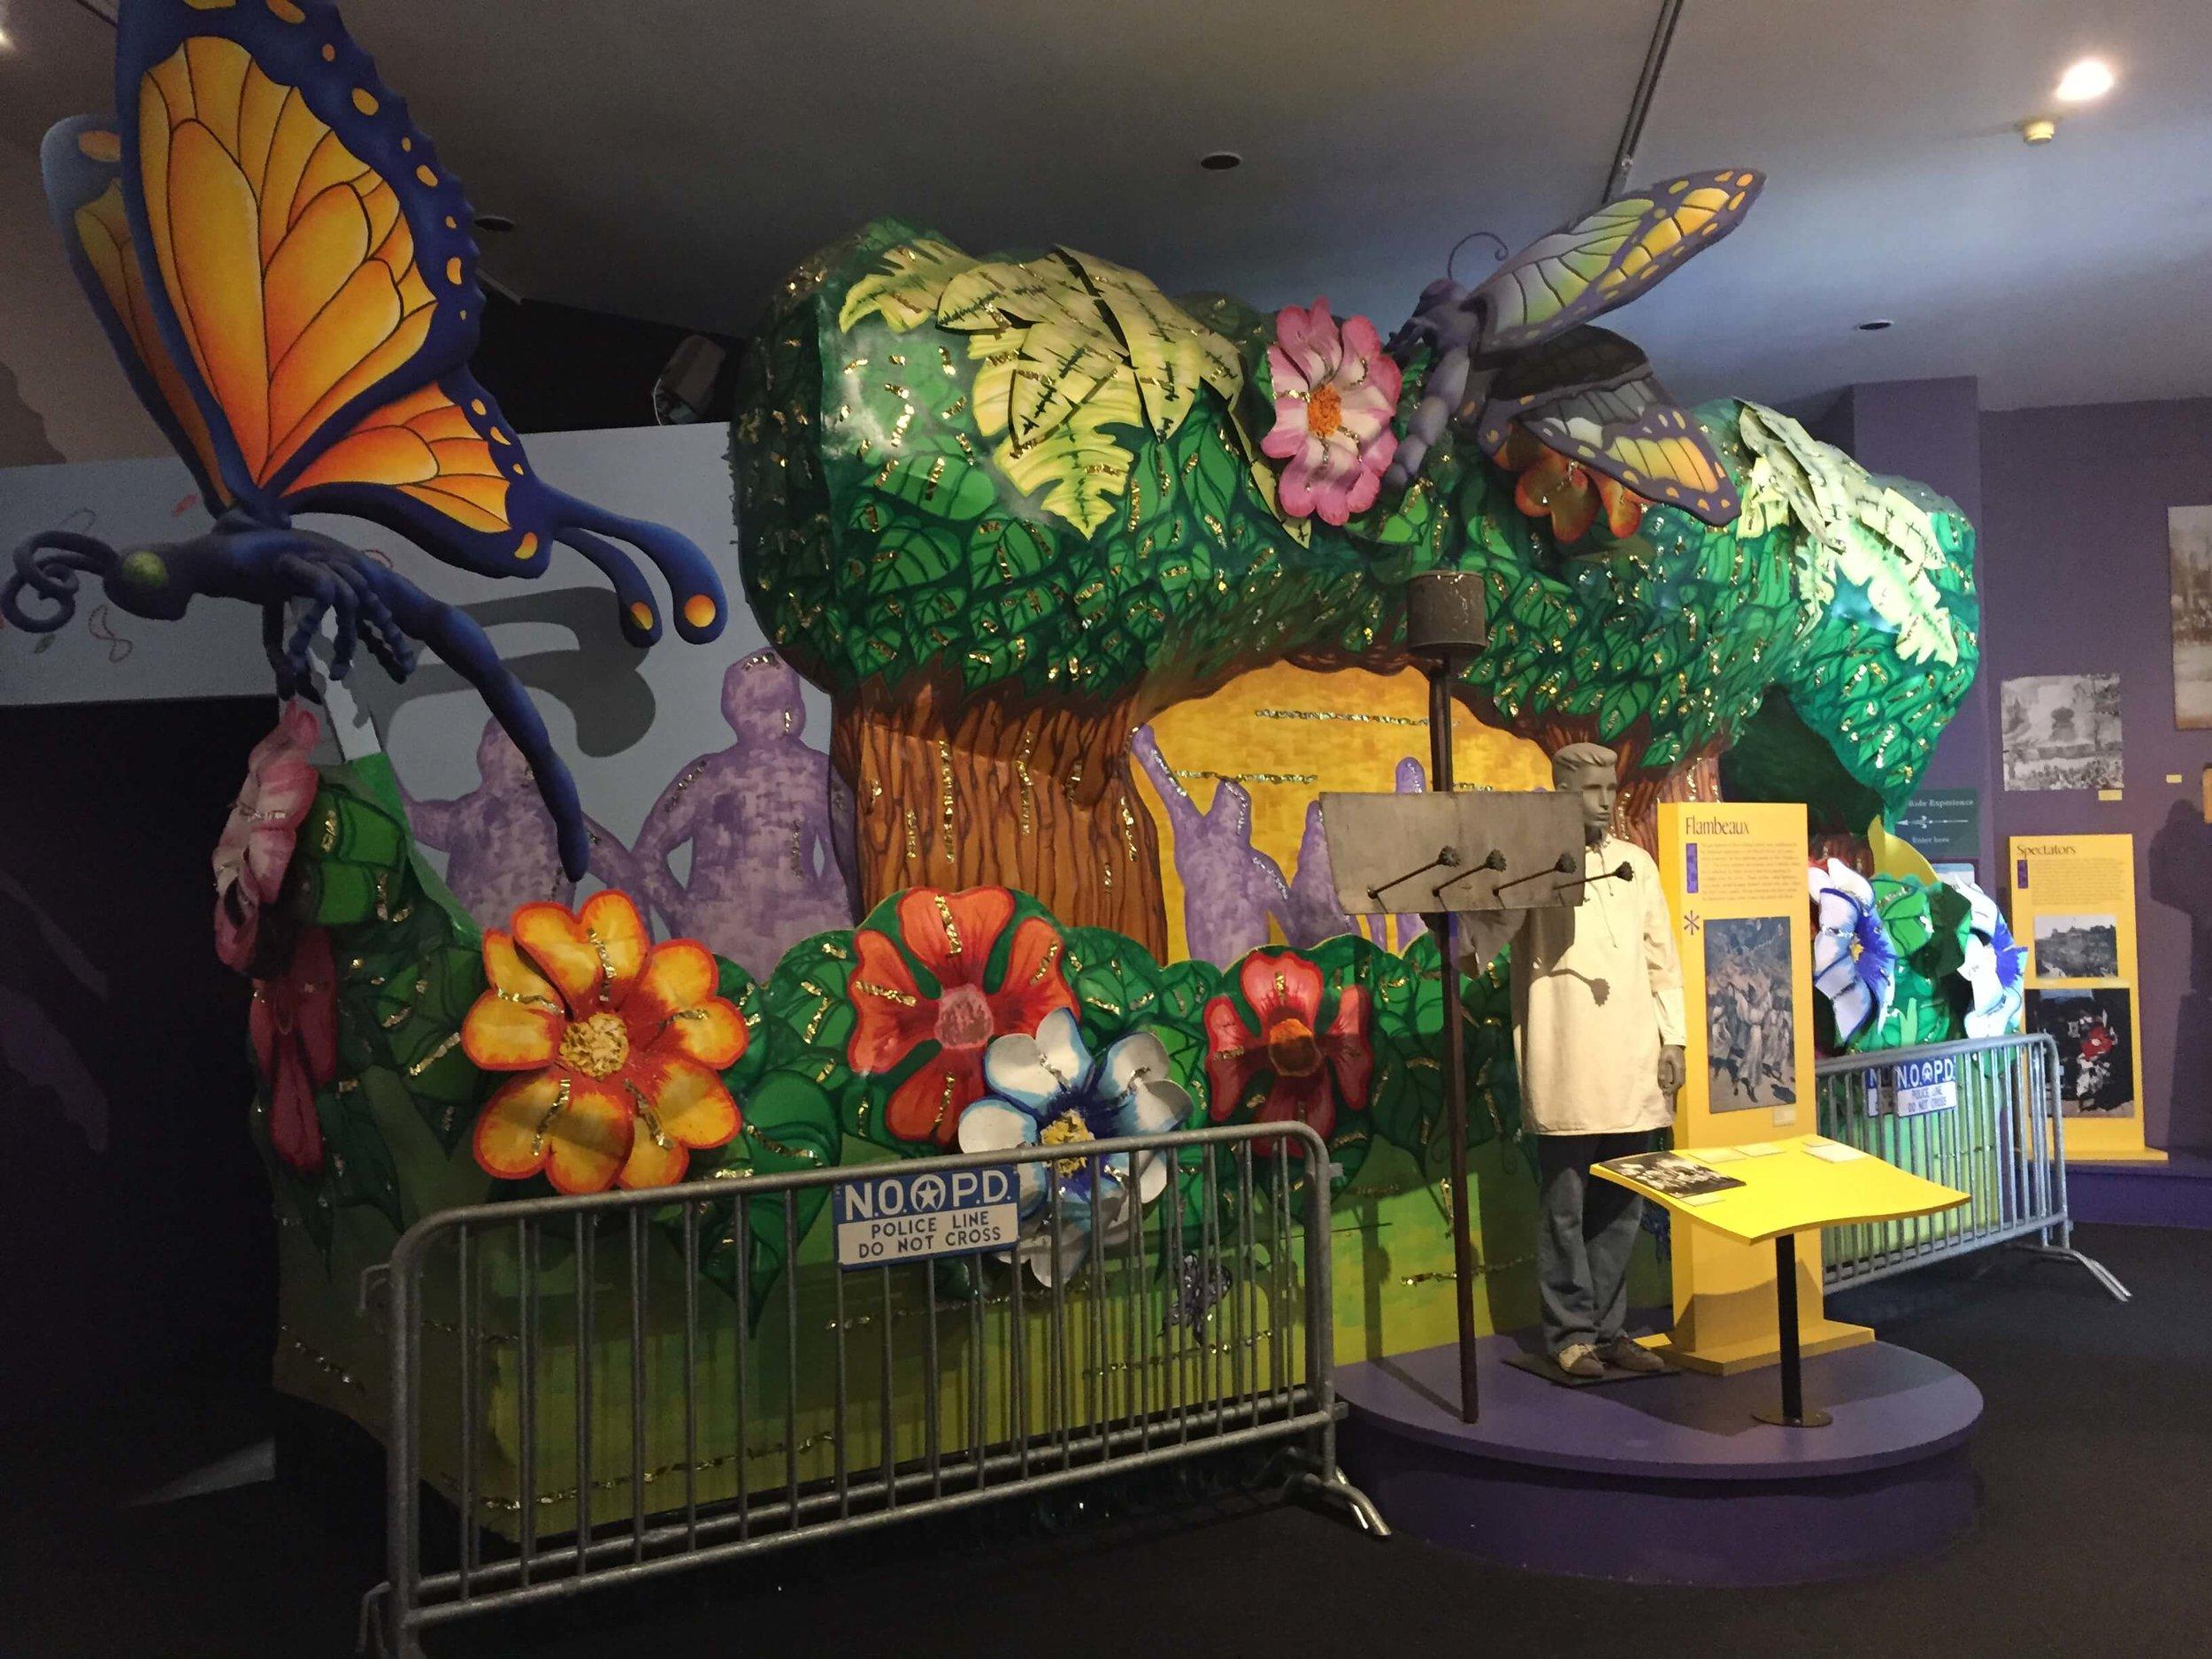 Mardi Gras Museum in New Orleans